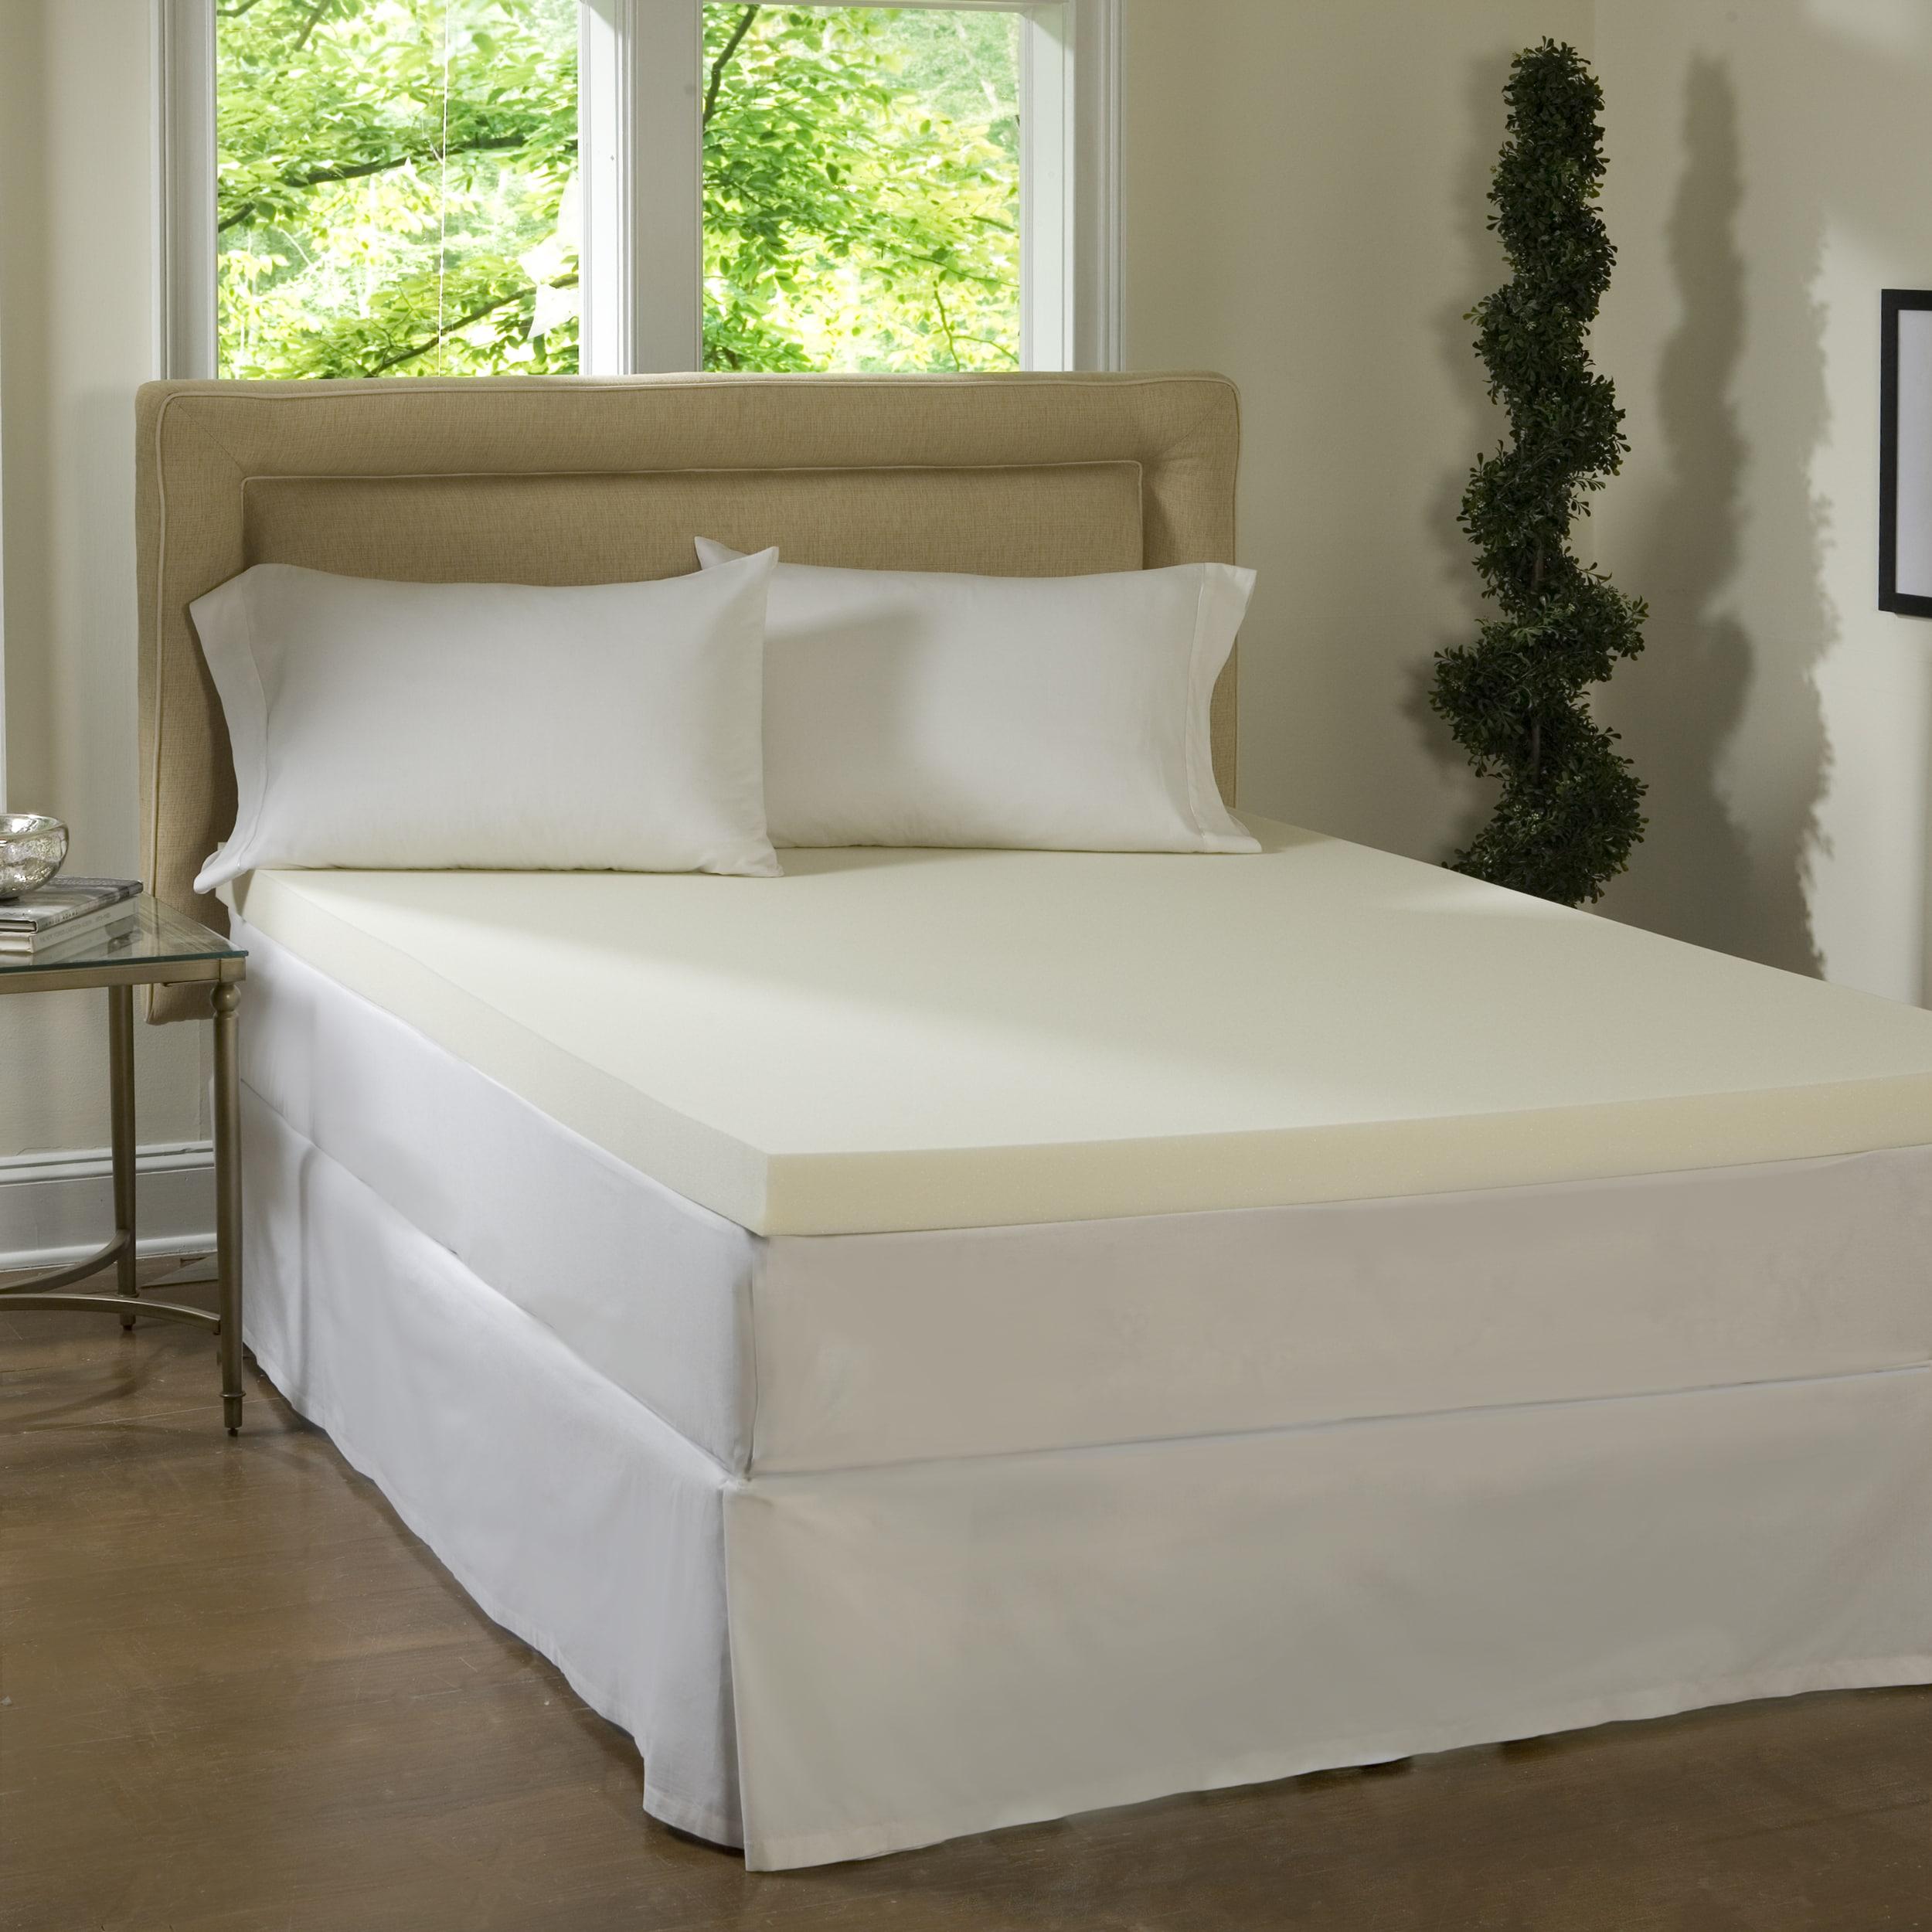 alternative full p gel memory pads infused lucid down pad foam hybrid toppers mattress